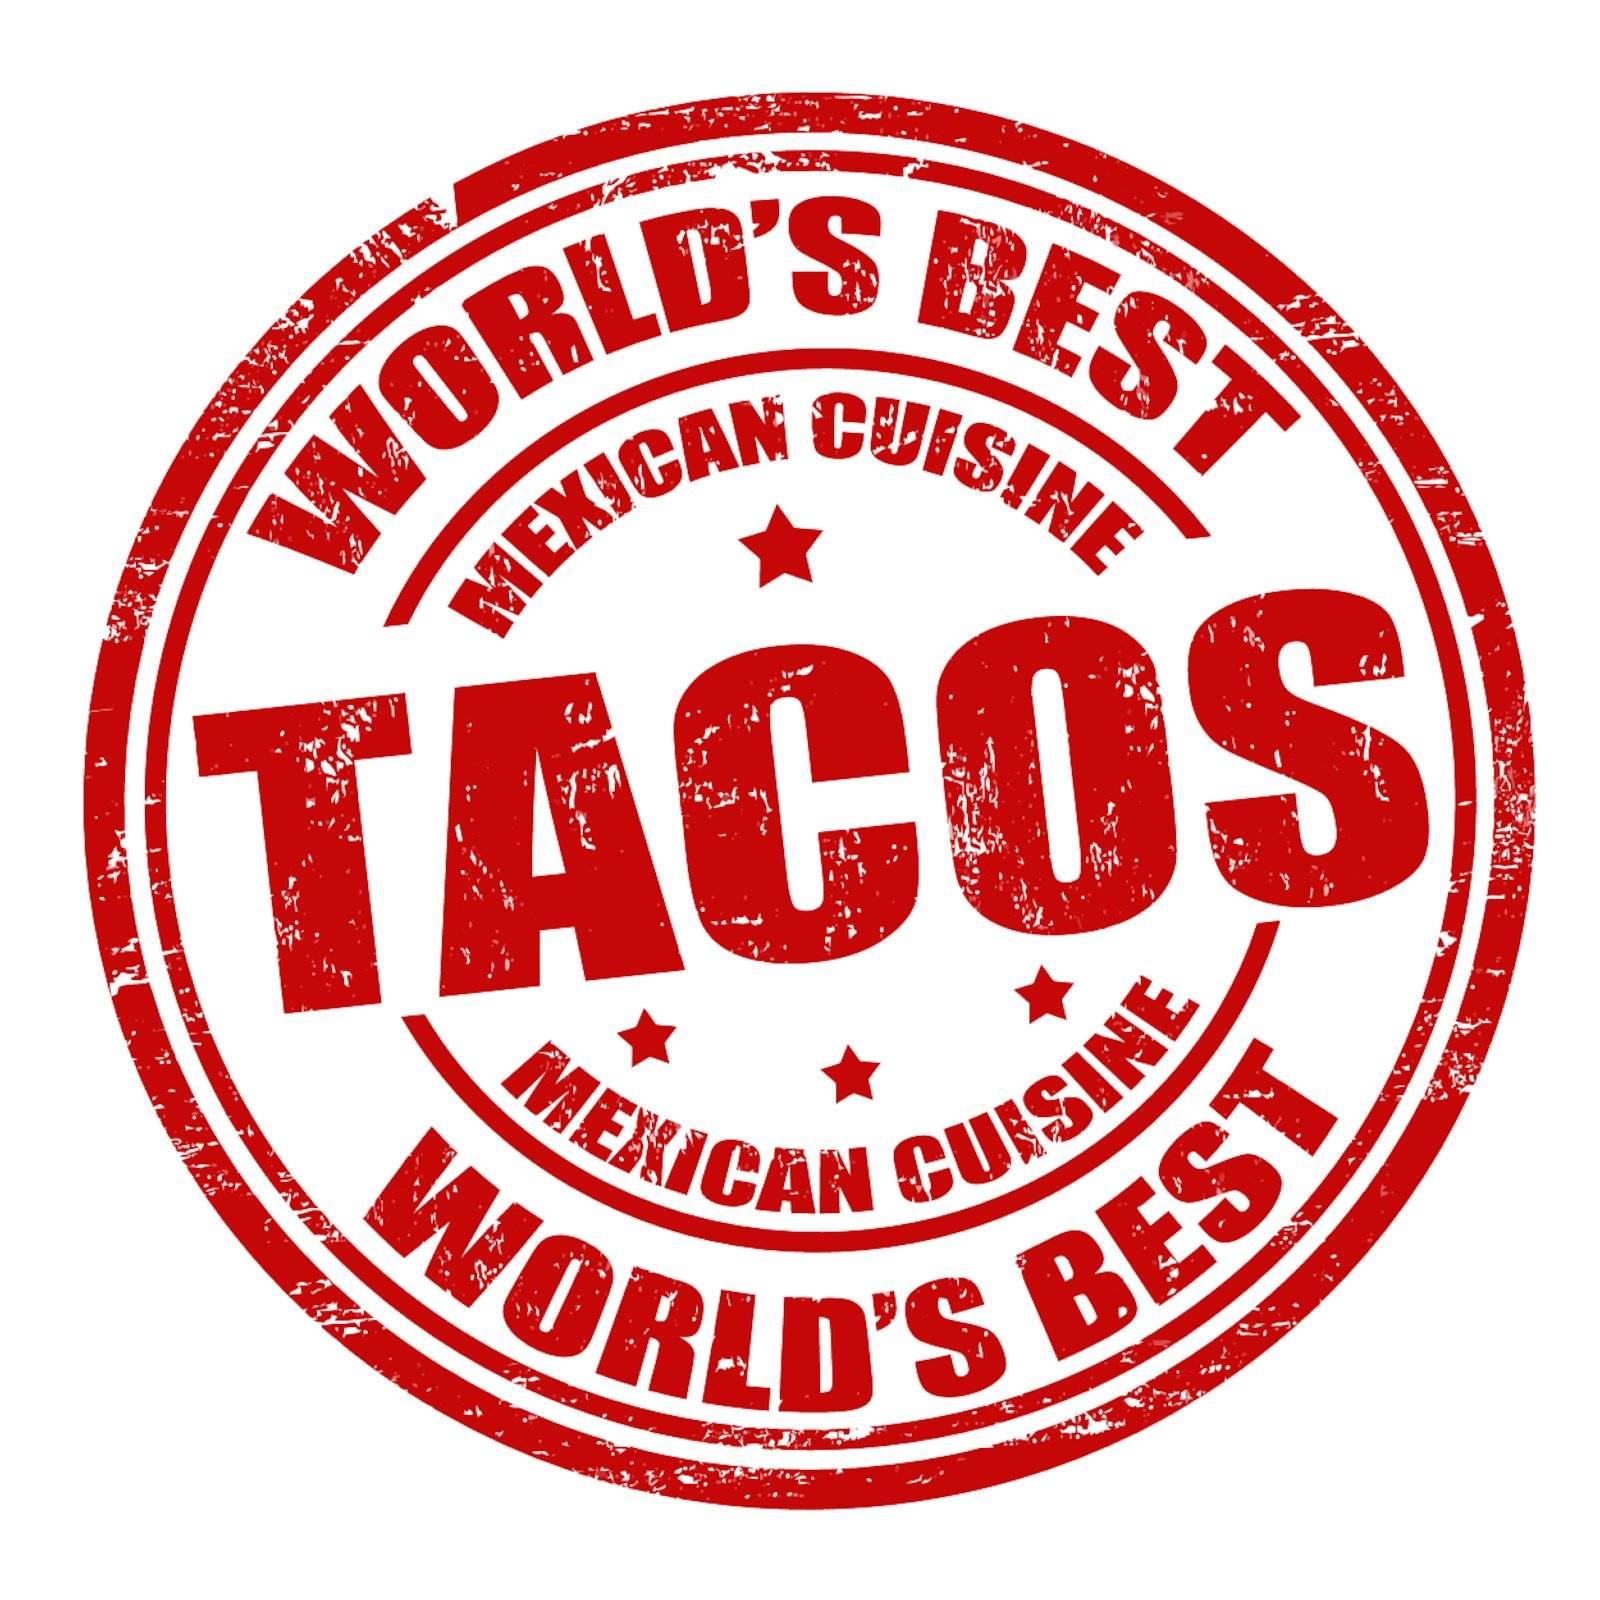 Tacos grunge rubber stamp on white background, vector illustration